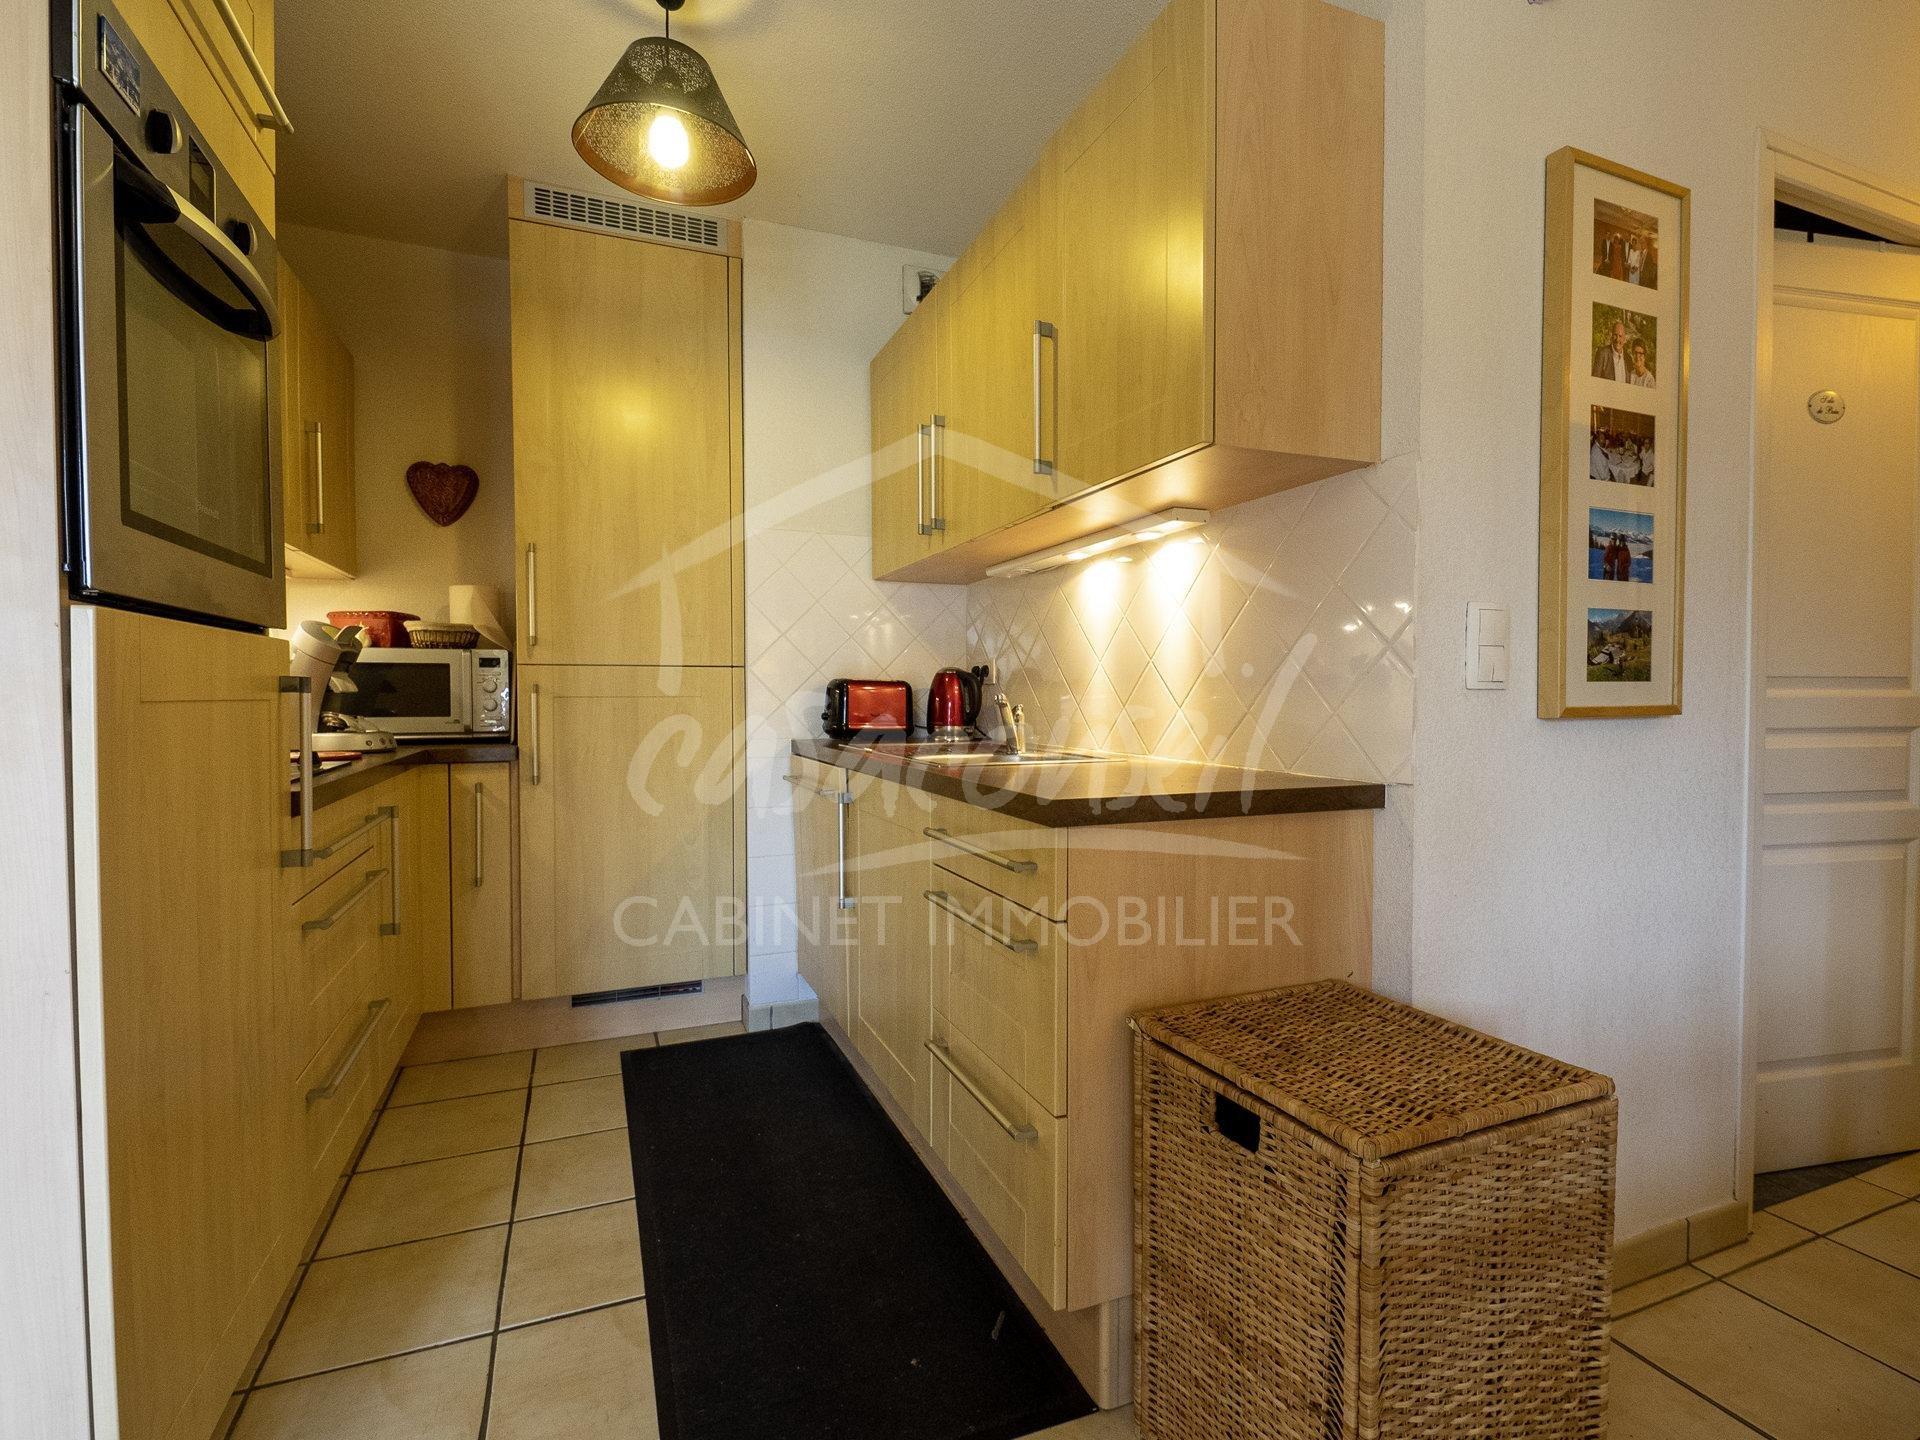 Vendita Appartamento - Saint-Gervais-les-Bains